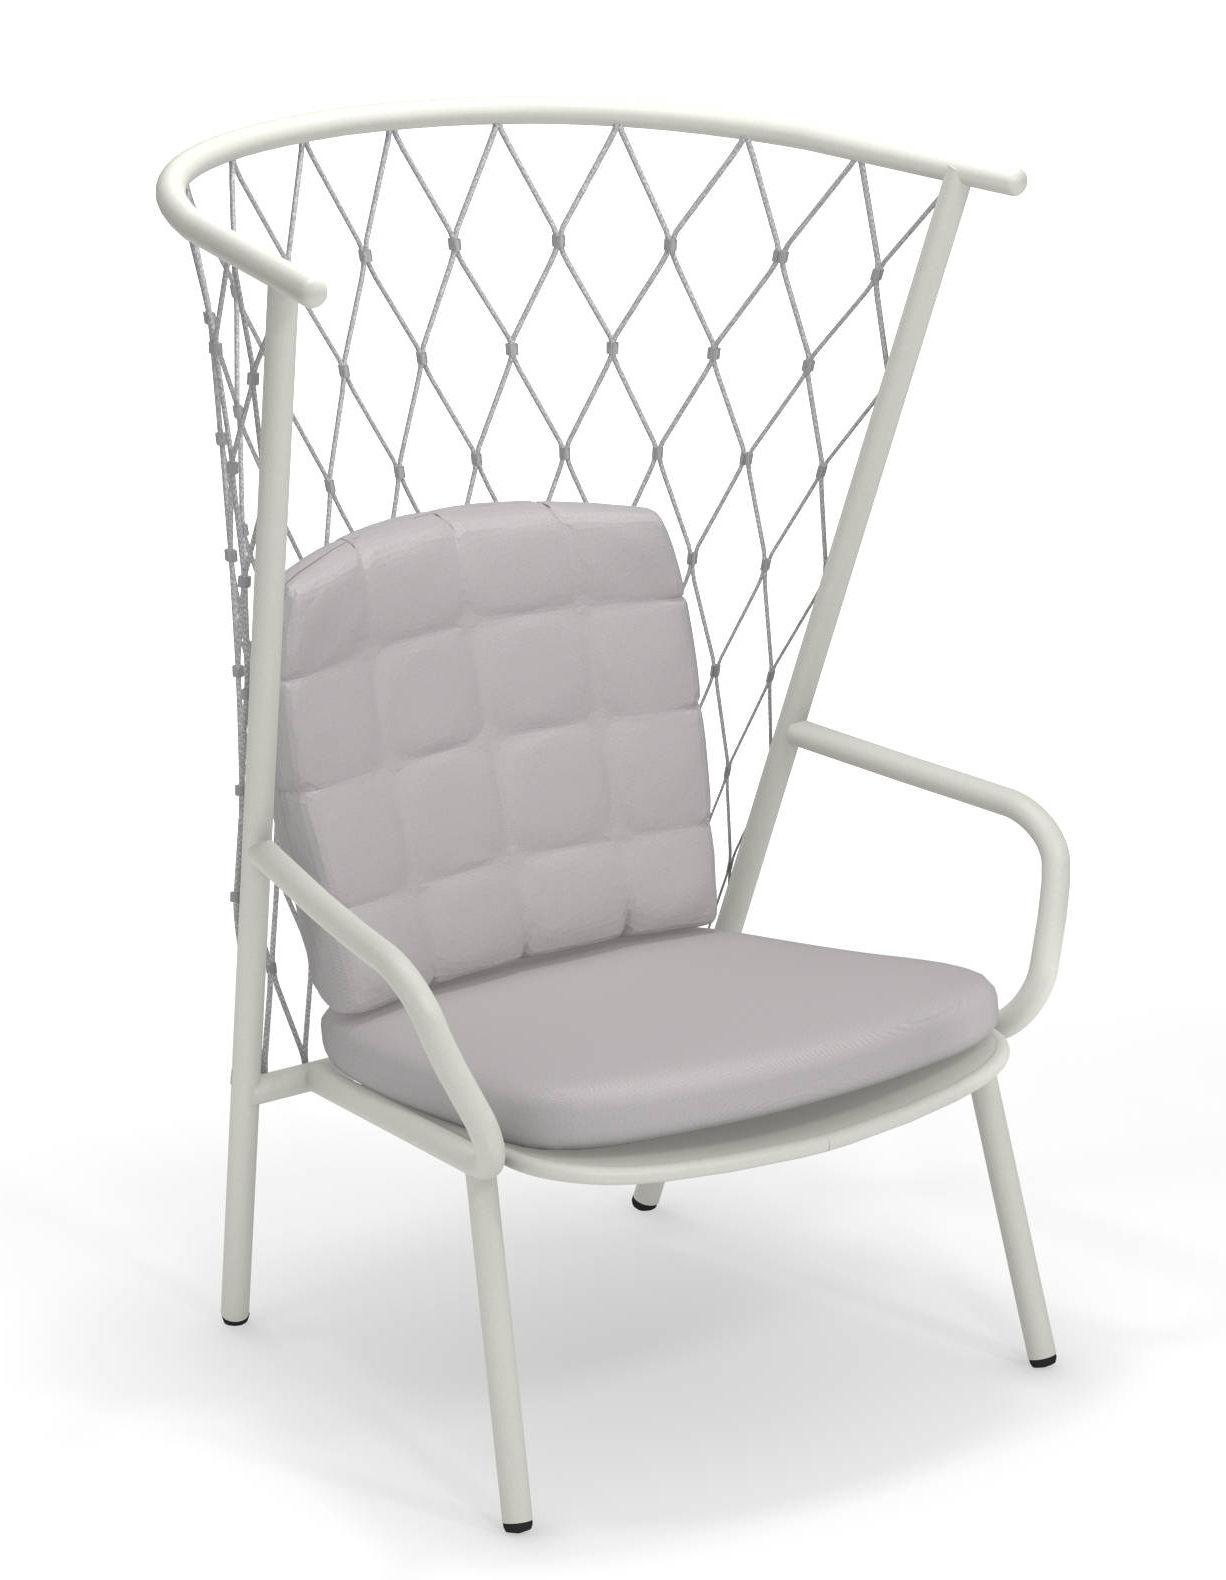 Möbel - Lounge Sessel - Nef Lounge Sessel / Rückenlehne H 125 cm - Emu - Sessel / Weiß & Rückenlehne grau - klarlackbeschichtetes Aluminium, Kunststoffseile